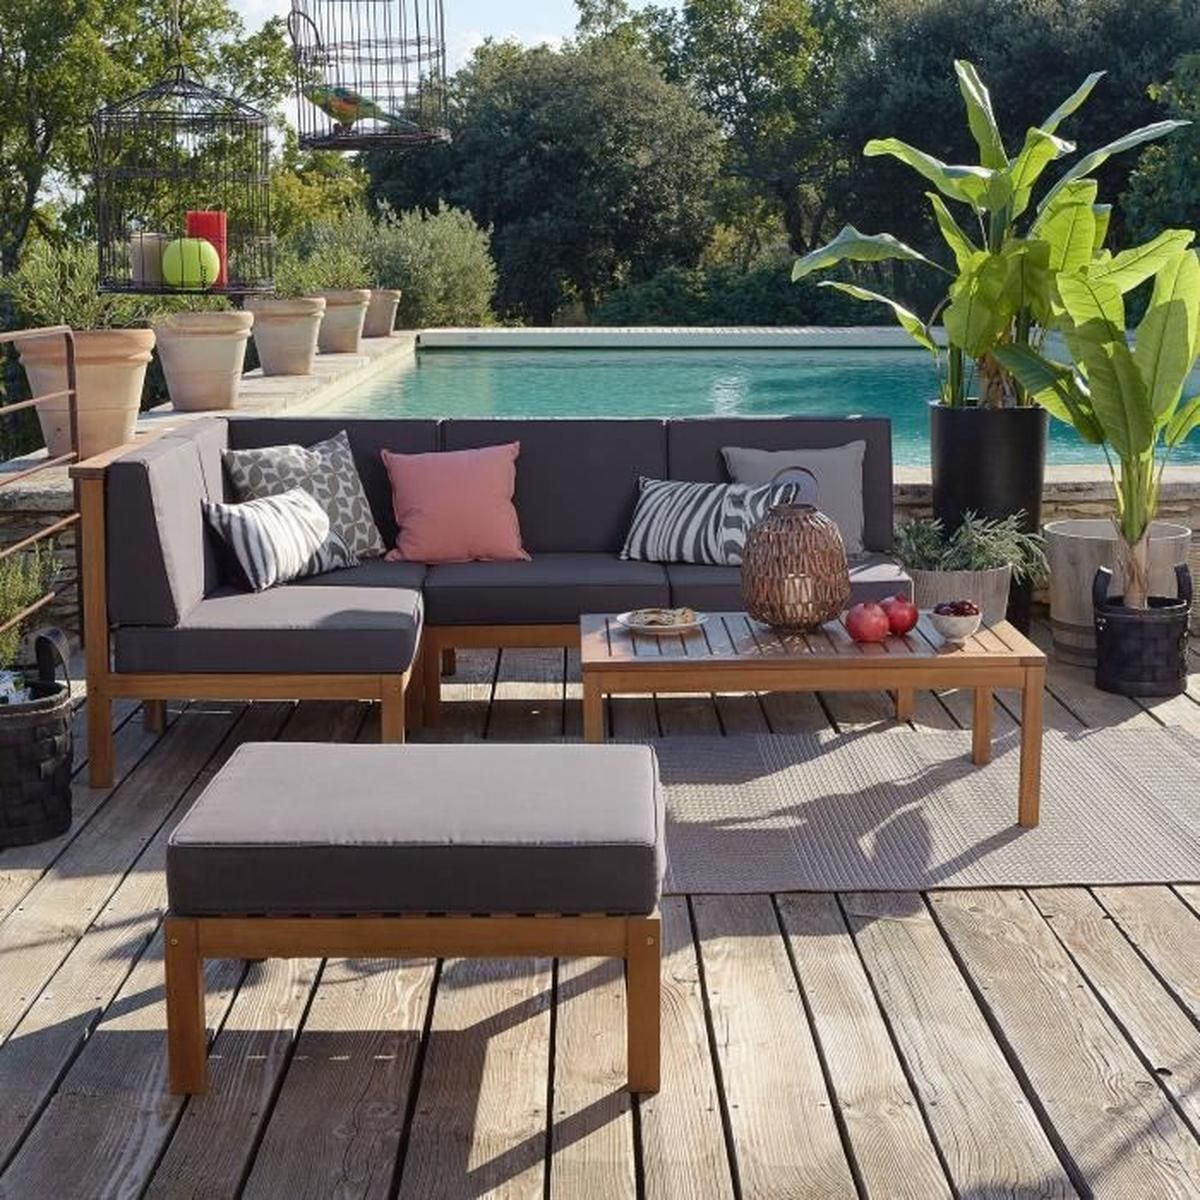 Cocoon Jardin Salon De Jardin En Acacia Massif (4 Places ... encequiconcerne Cdiscount Salon De Jardin